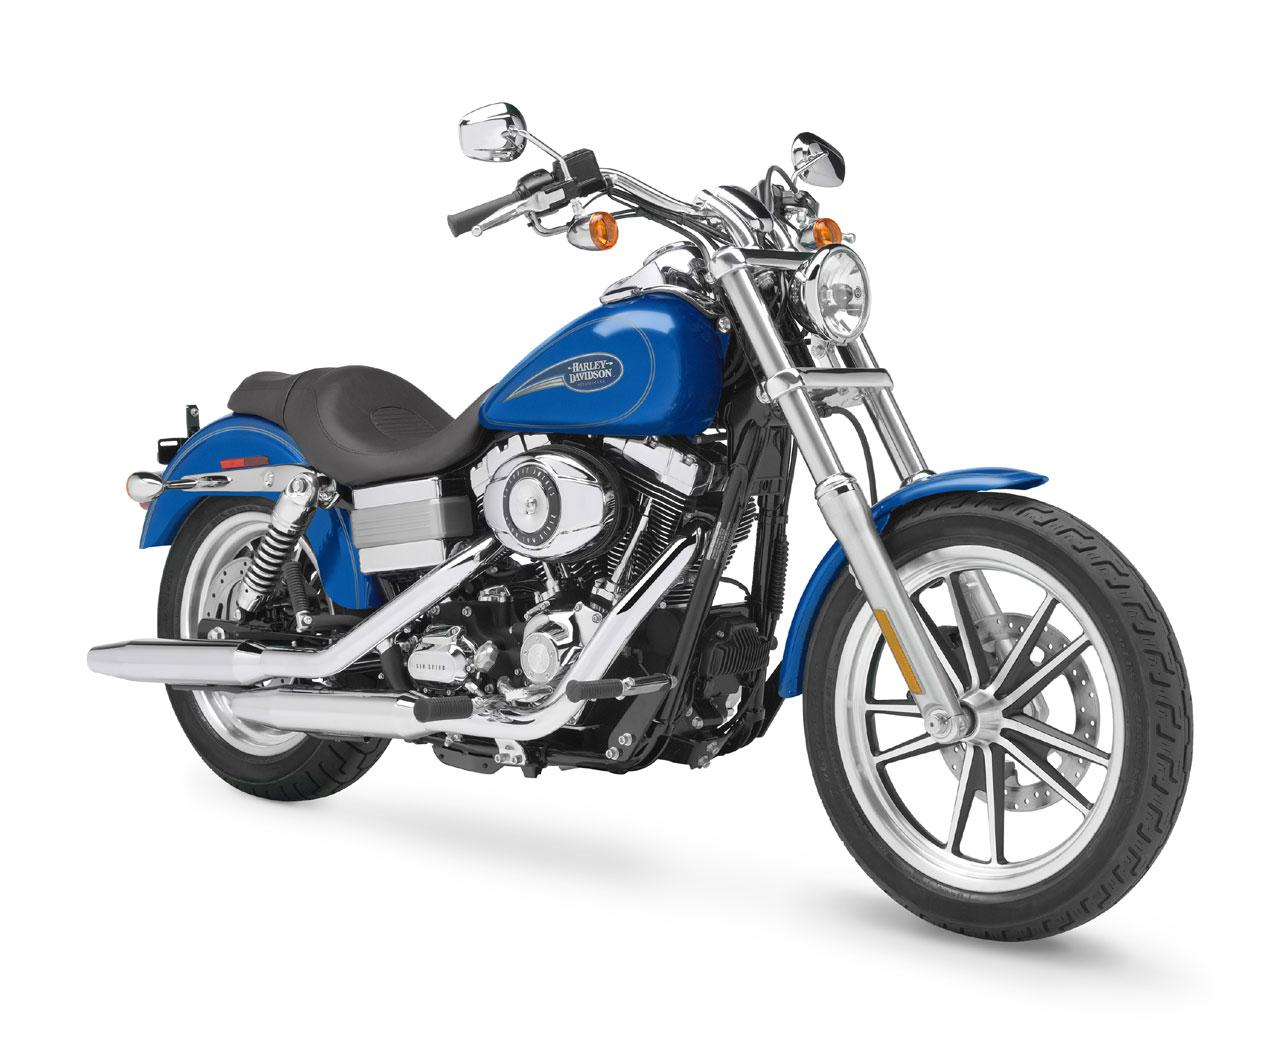 Harley Davidson Dyna Low Rider Reviews